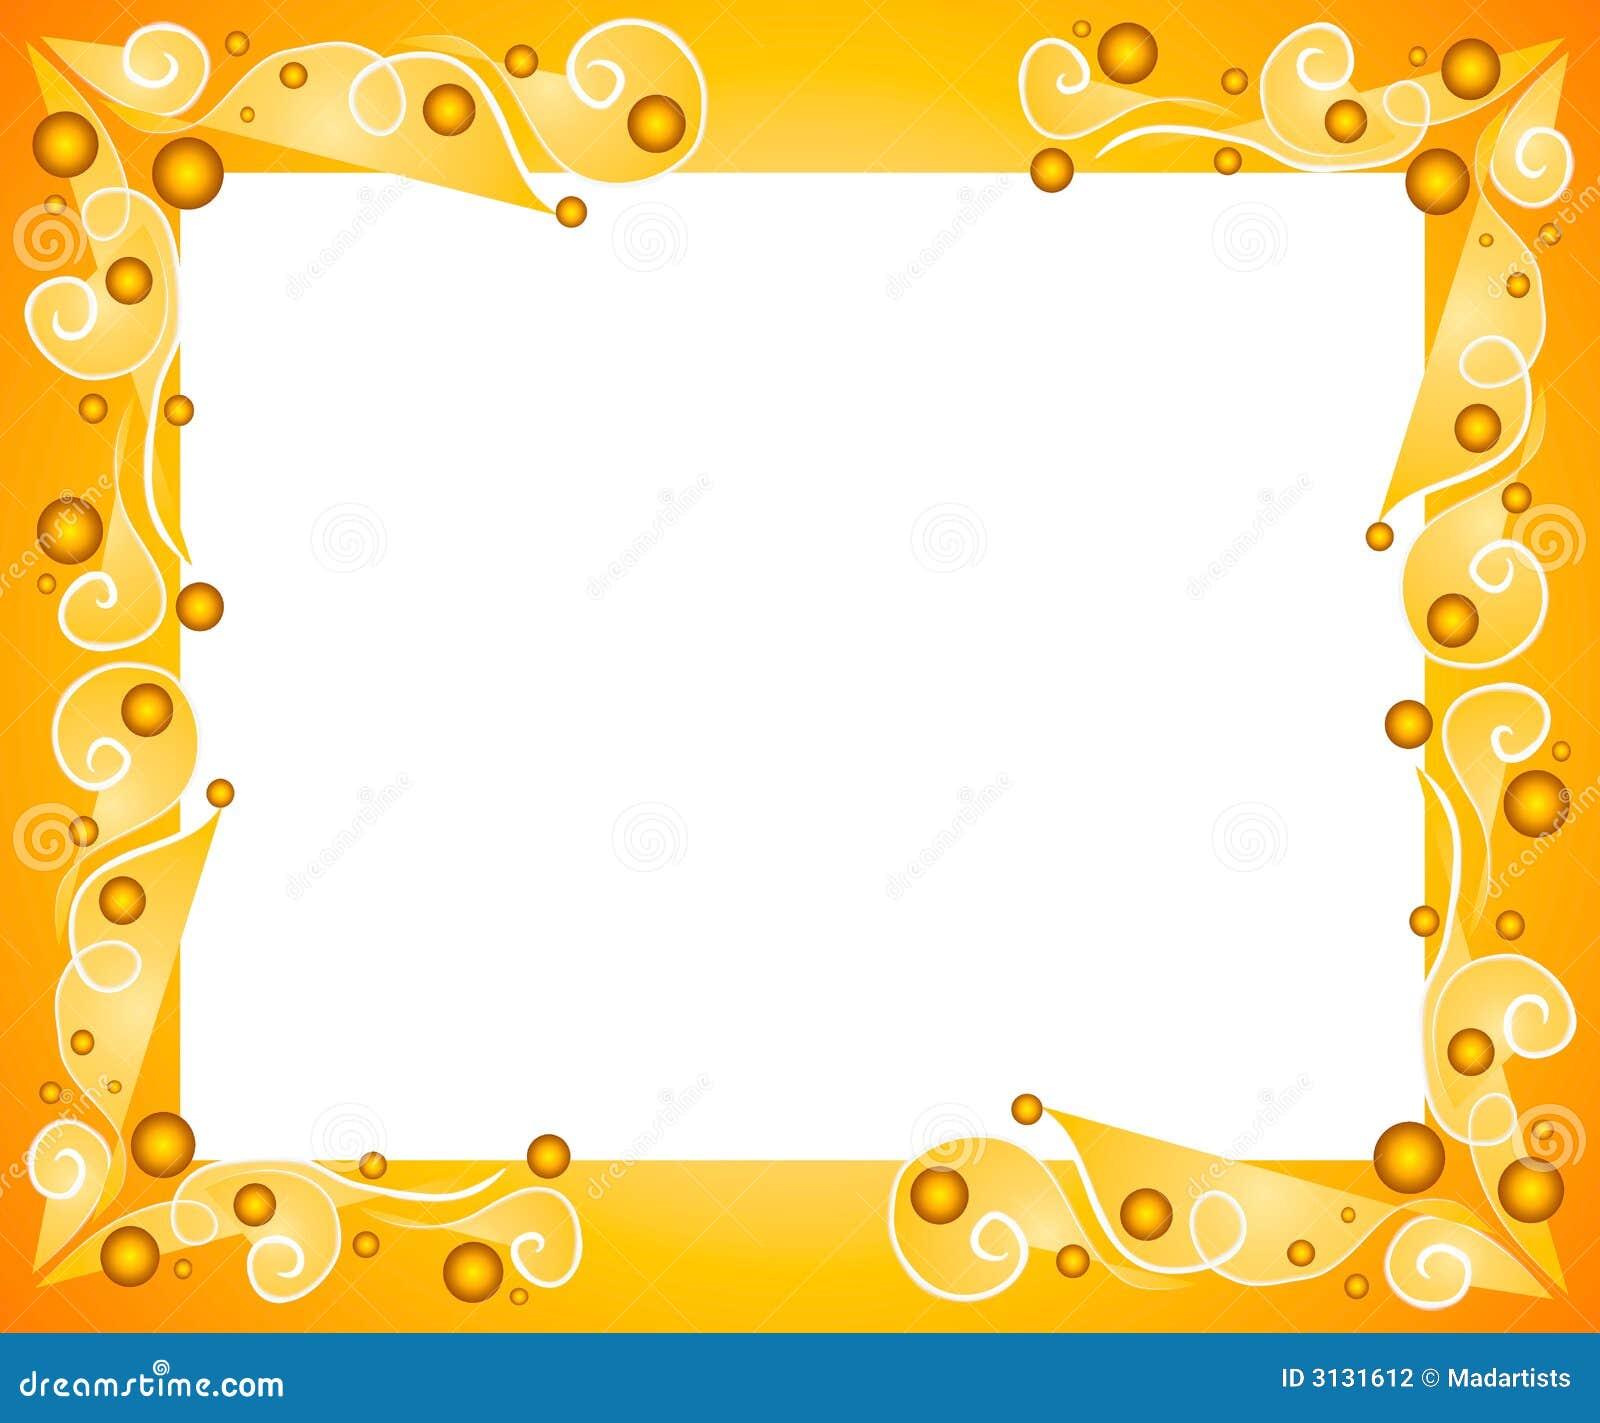 Decorative gold frame border stock illustration for Frame designs